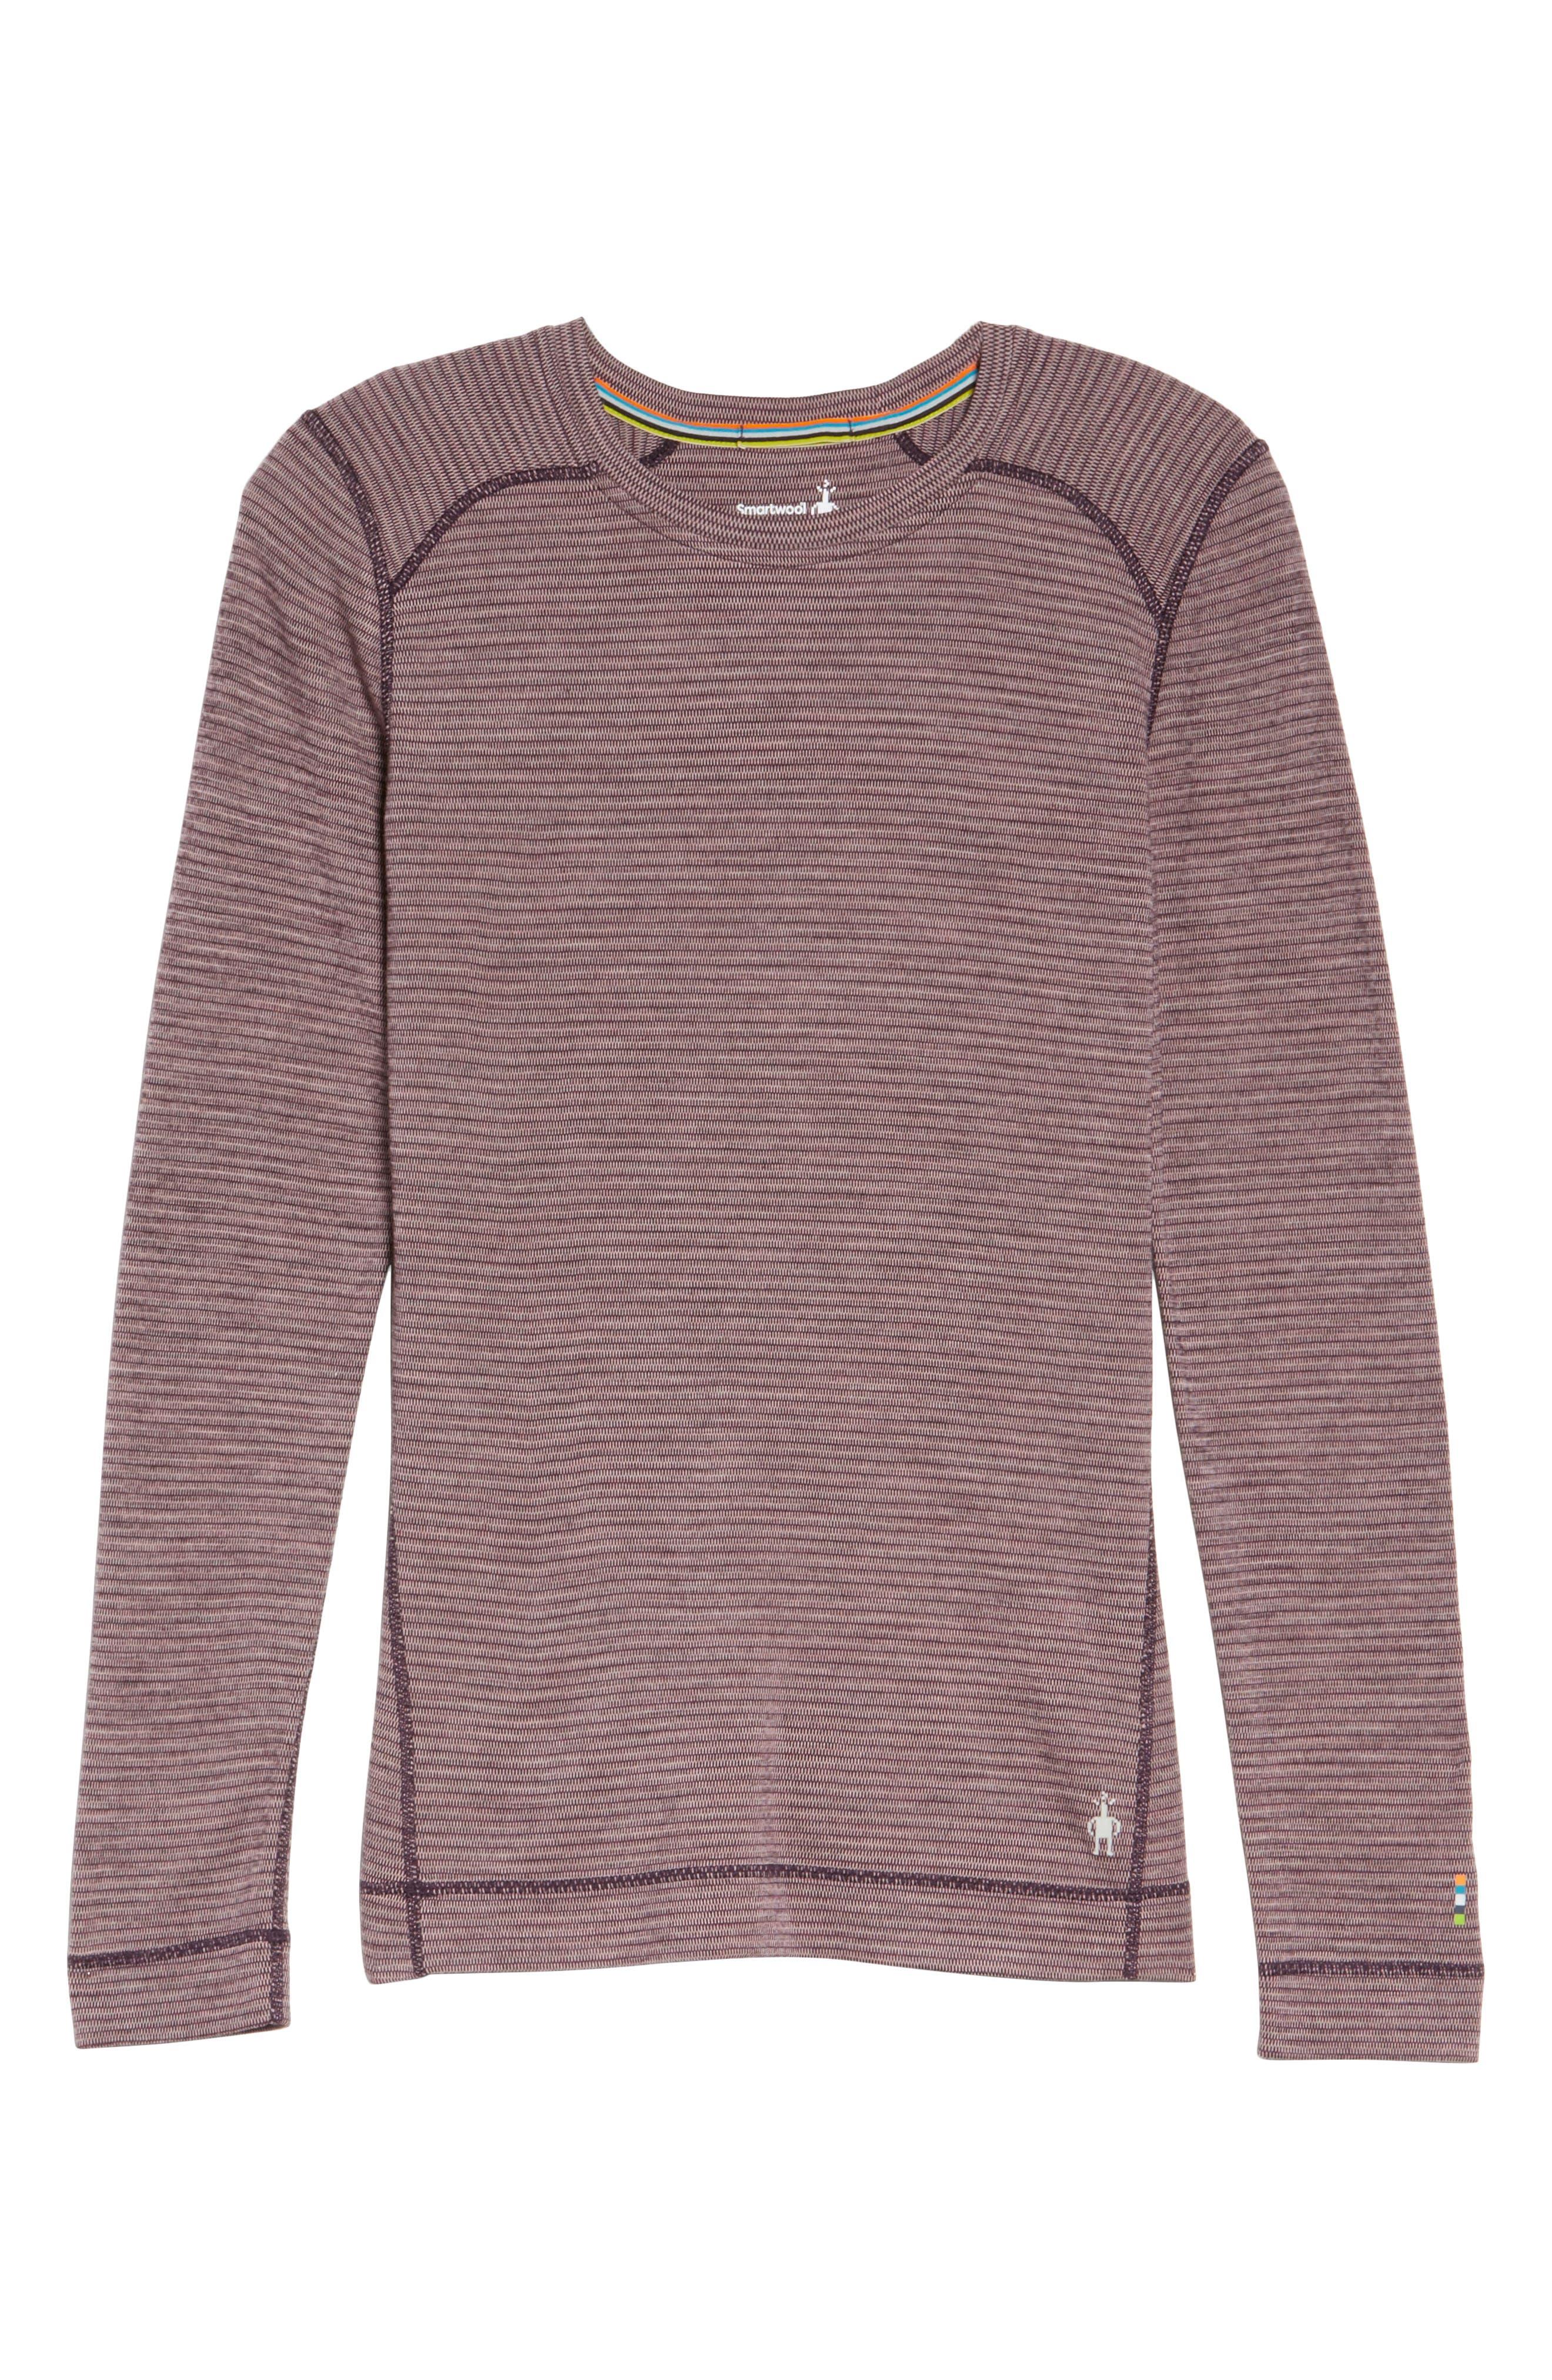 Merino Wool 250 Base Layer Top,                             Alternate thumbnail 7, color,                             BORDEAUX